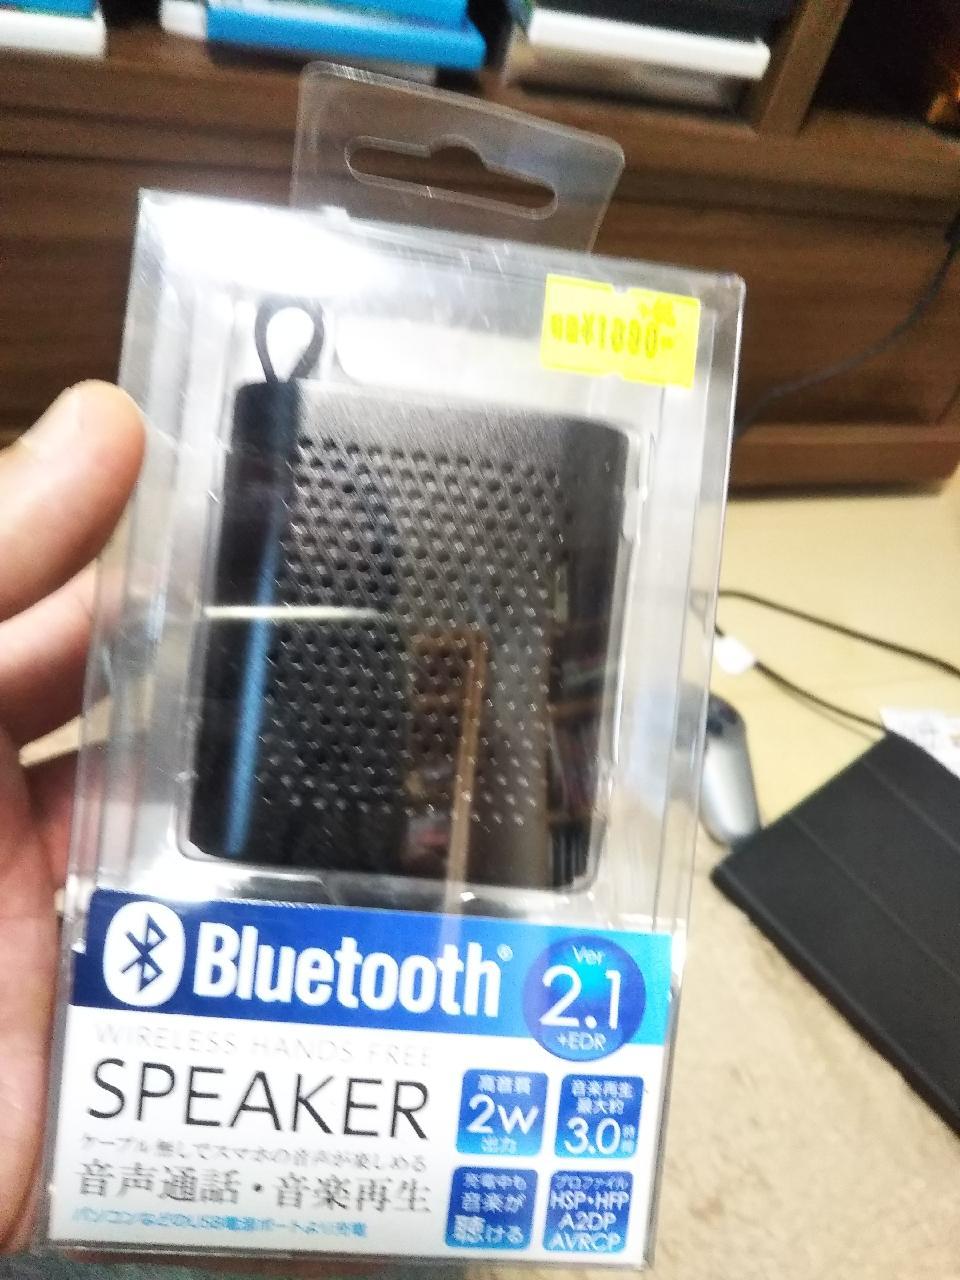 ING / 多摩電子工業 bluetooth 携帯スピーカー